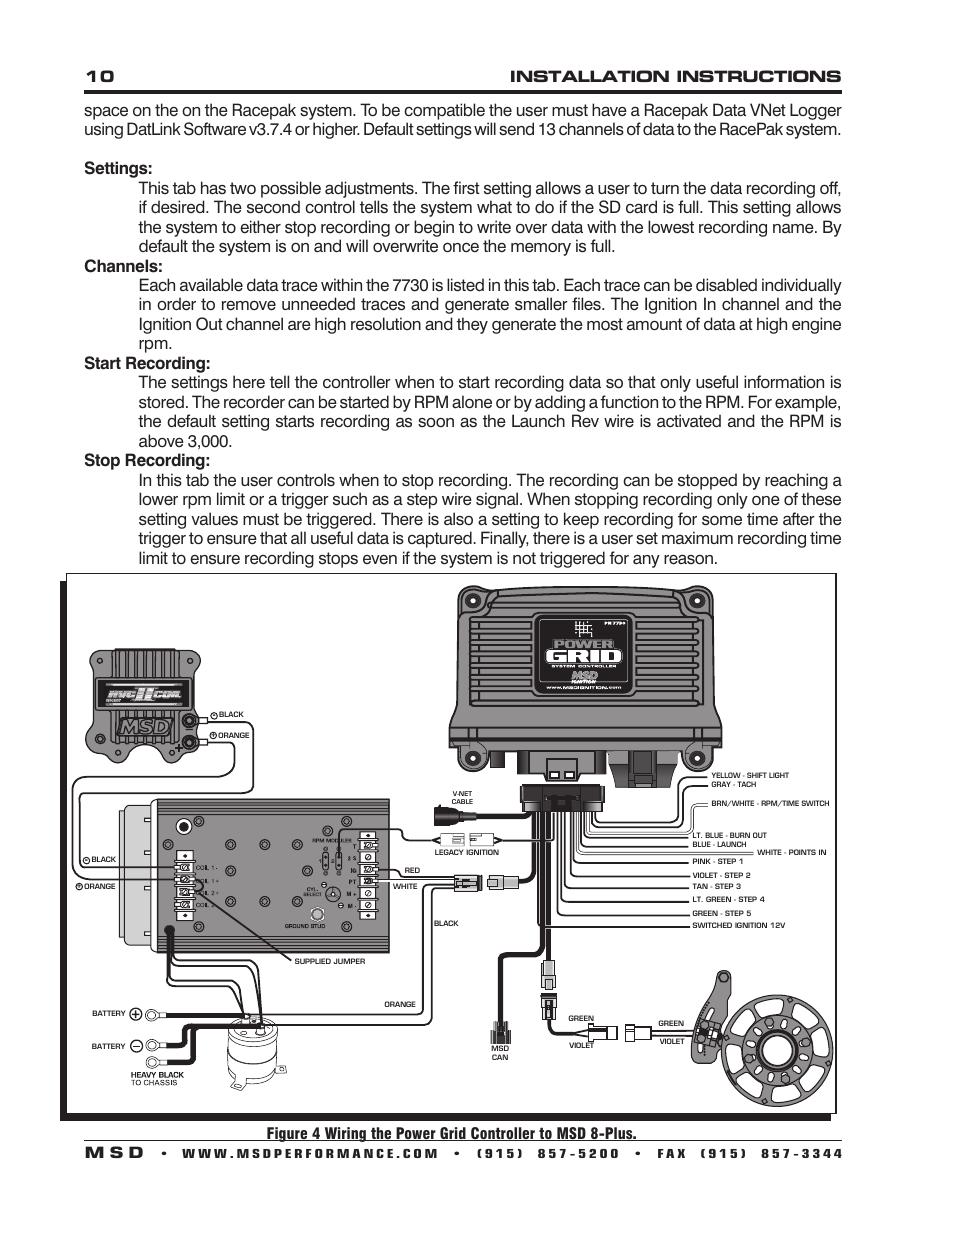 medium resolution of msd power grid wiring diagram wiring diagram view msd ignition power grid diagram